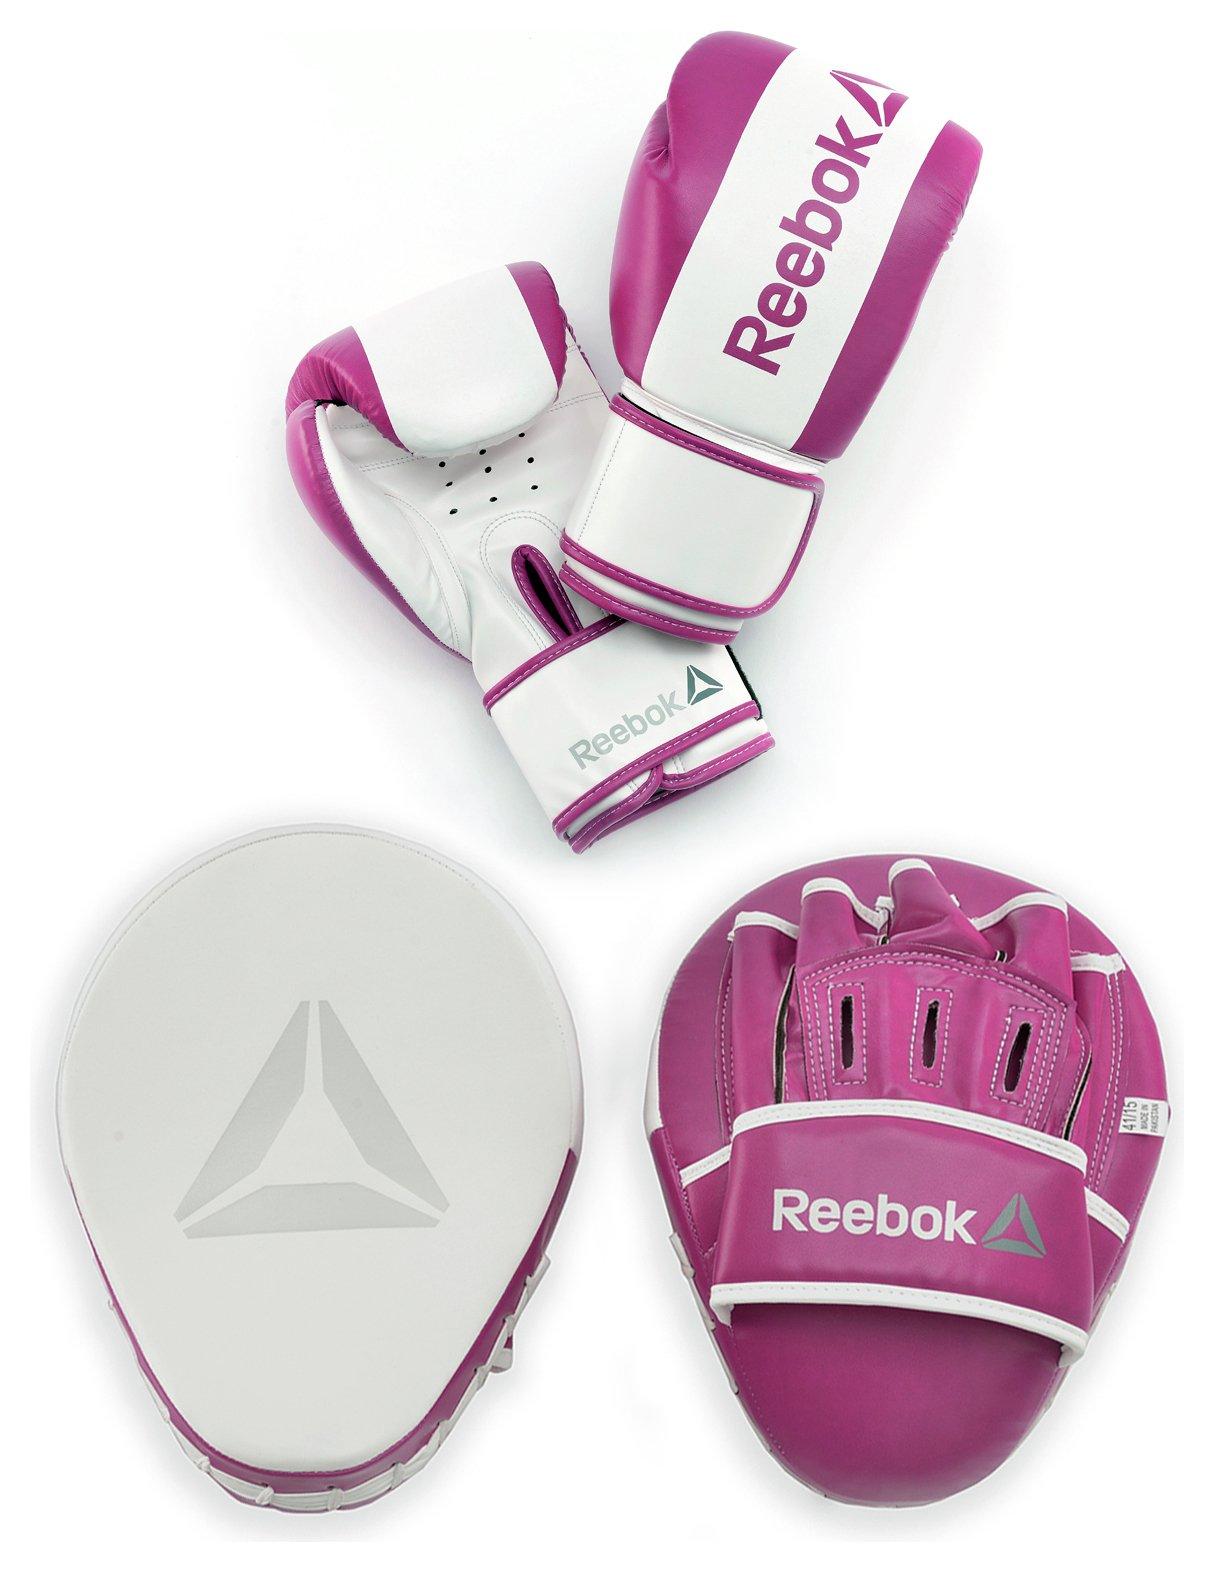 reebok-womans-boxercise-set